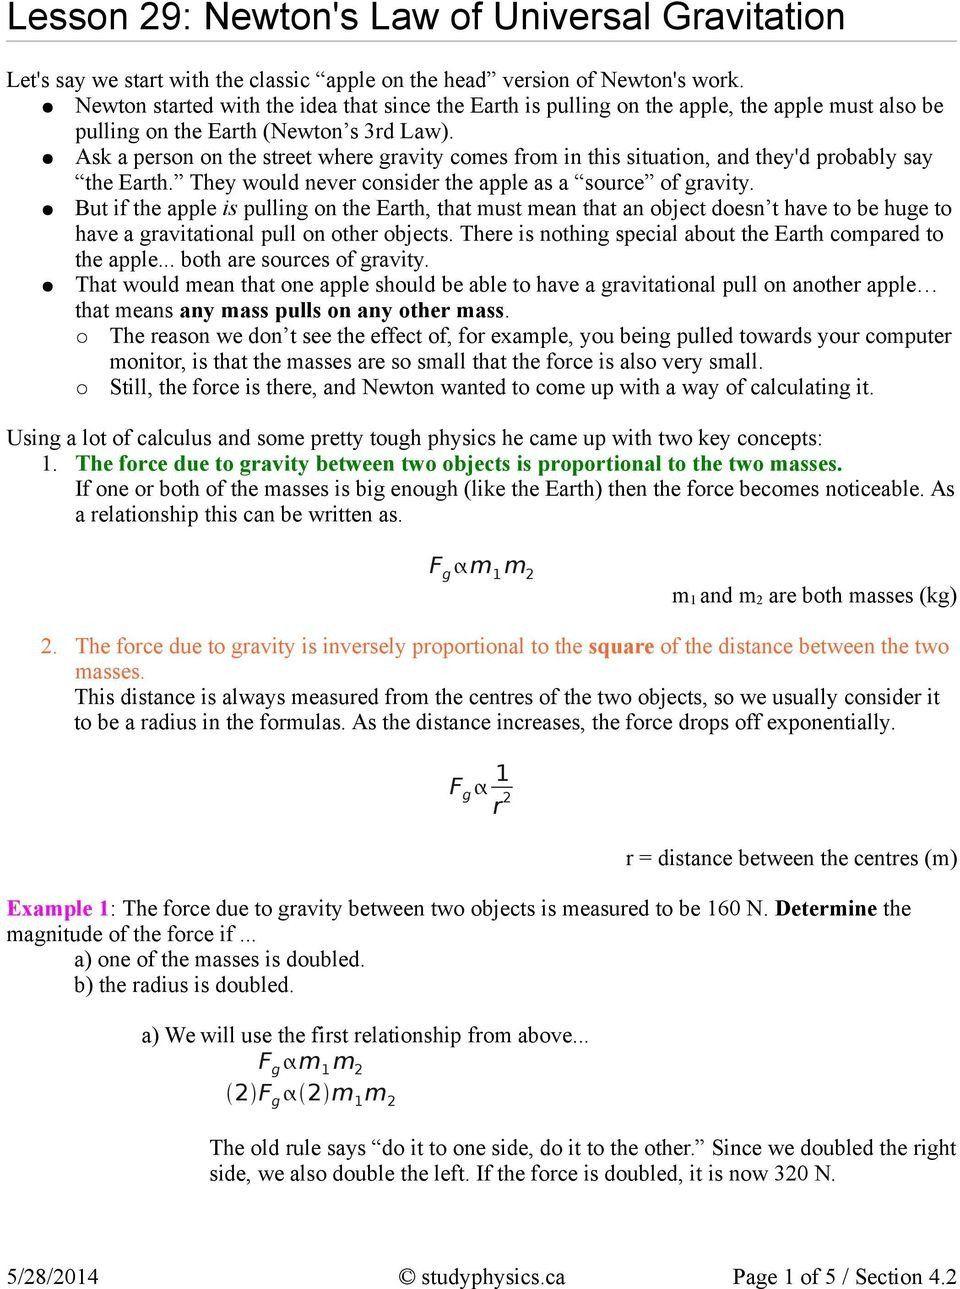 Universal Gravitation Worksheet Answers Lesson 29 Newton S Law Of Universal Gravitation Pdf Free In 2020 Worksheet Template Physics Answers Worksheets